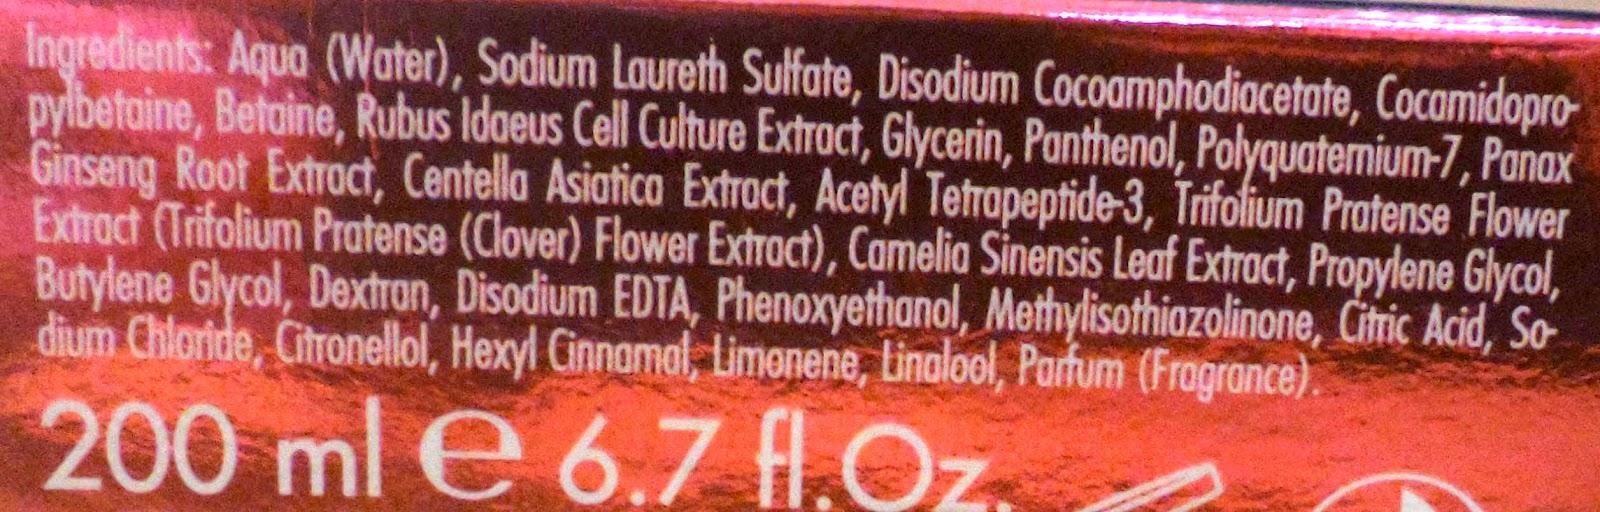 biopoint anti caida mujer ingredientes